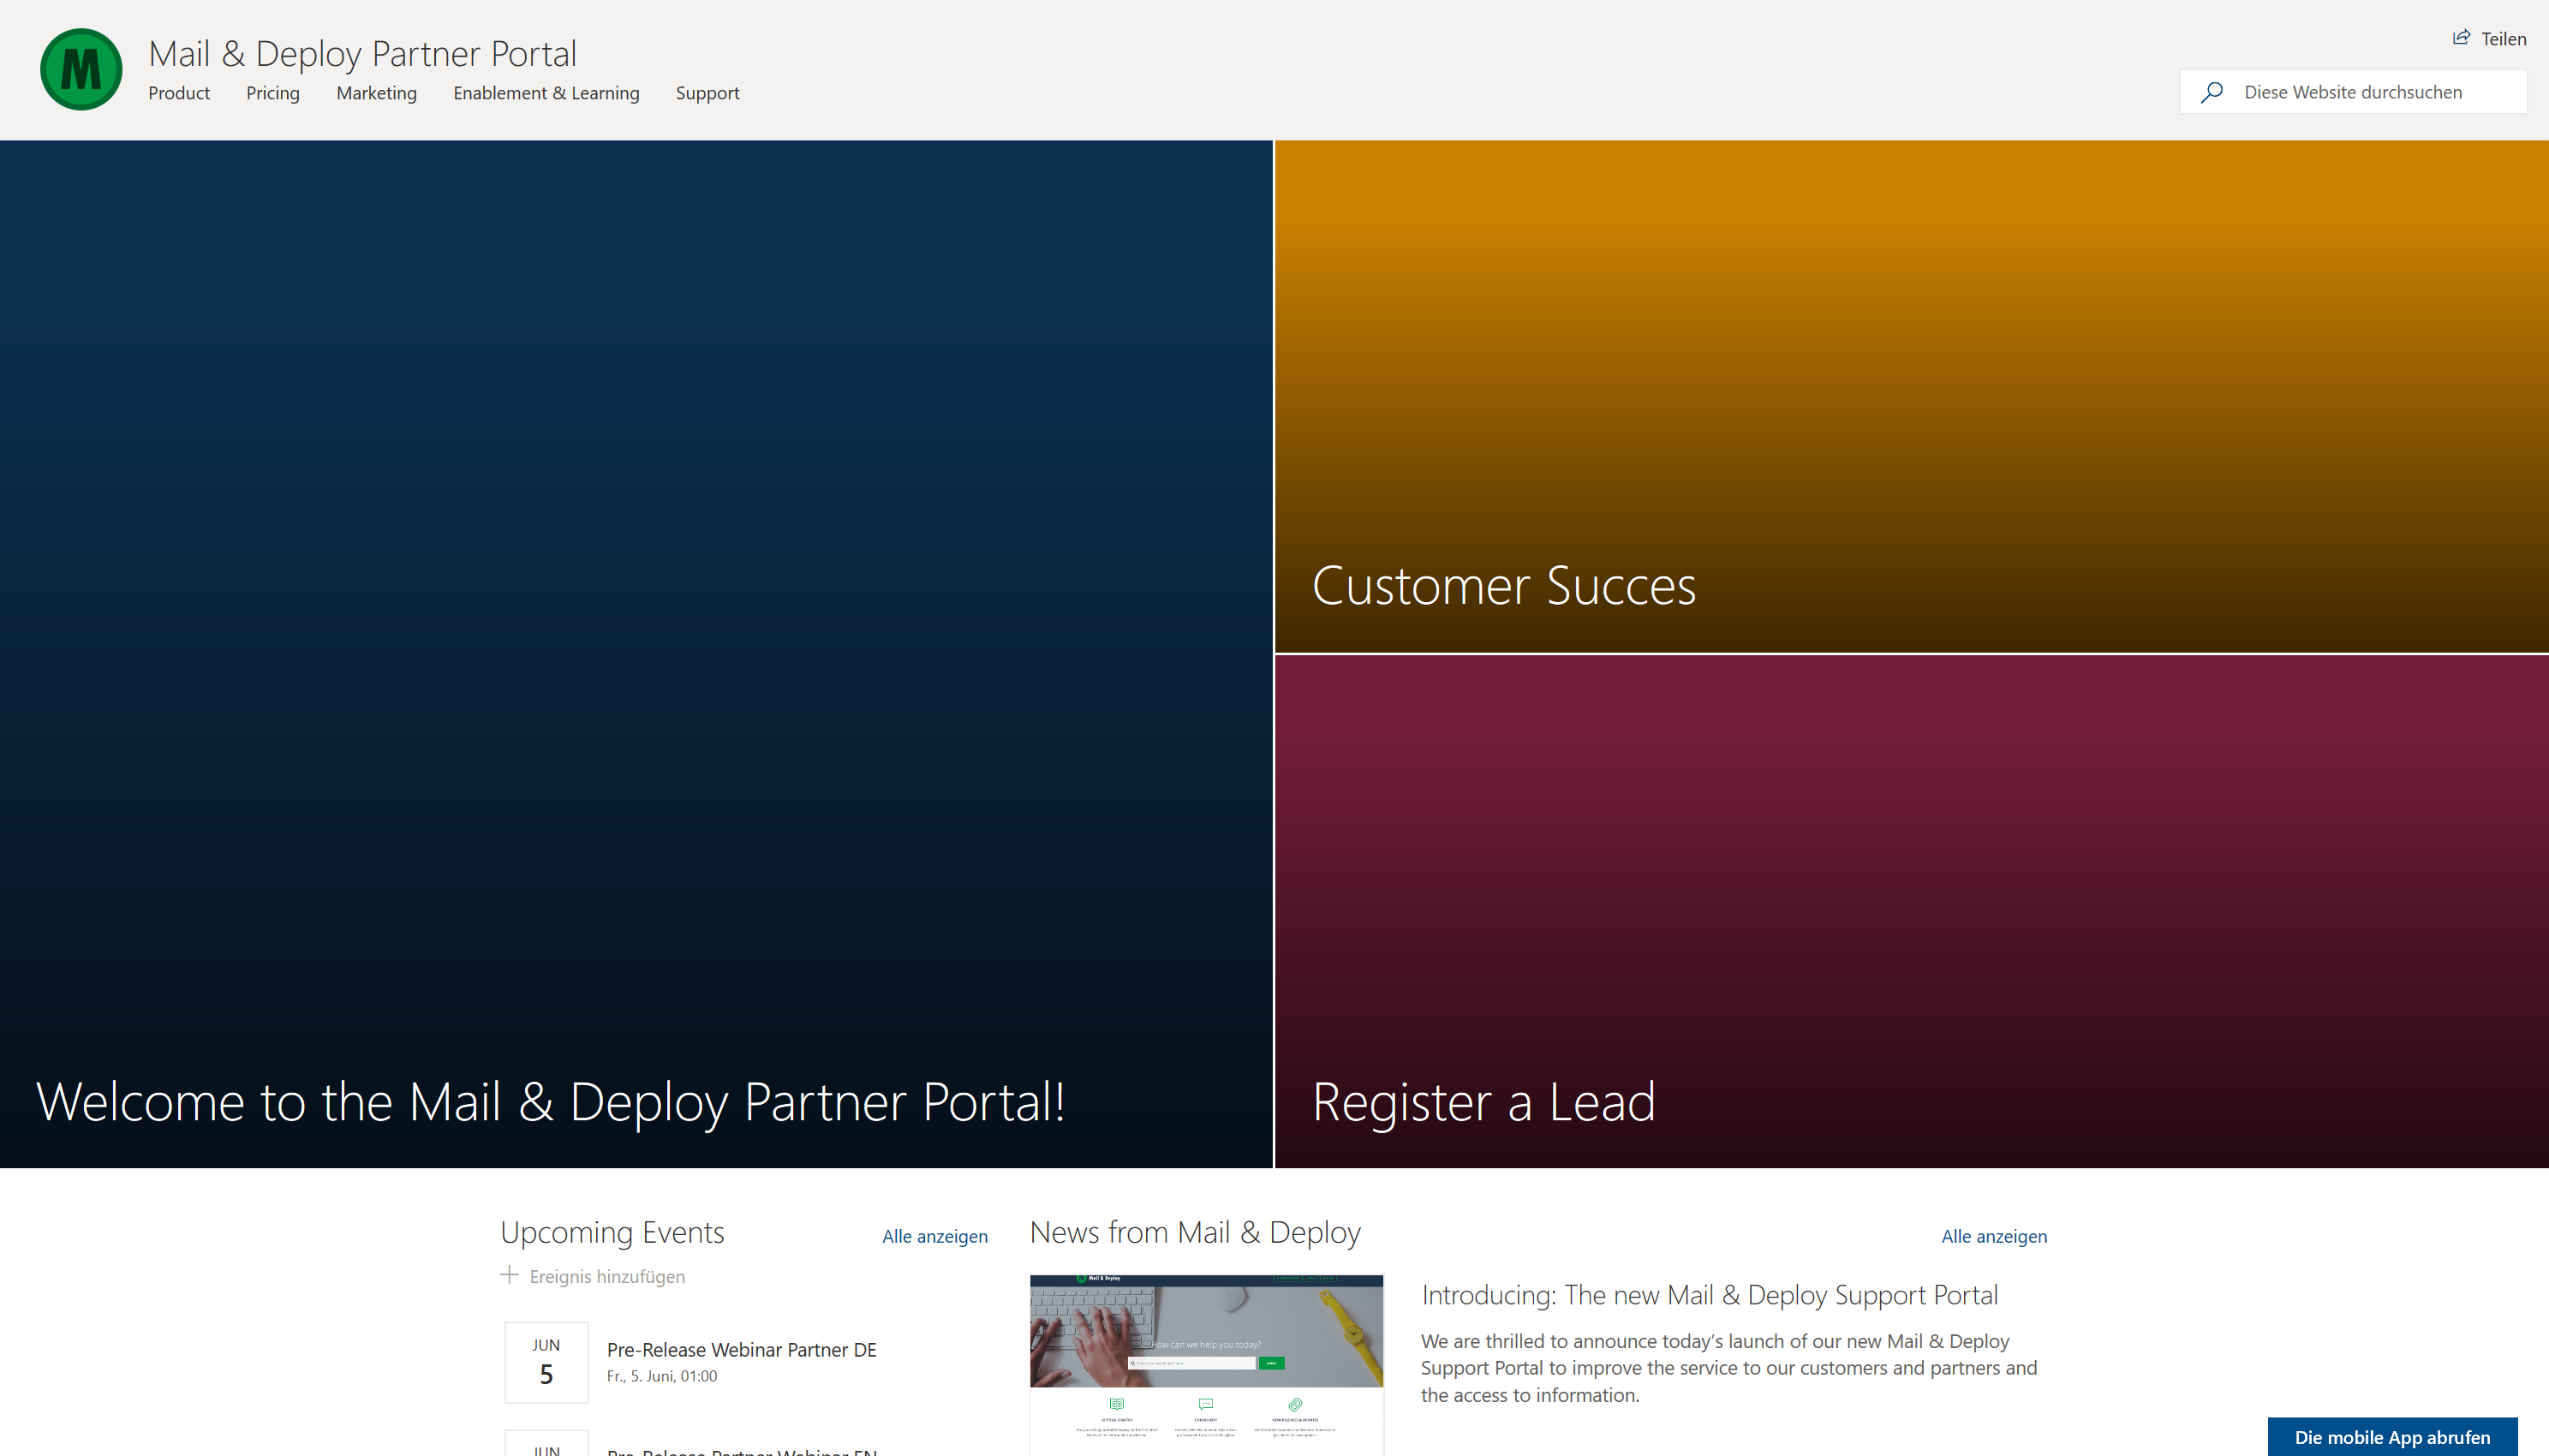 Screenshot of the Mail & Deploy Partner Portal